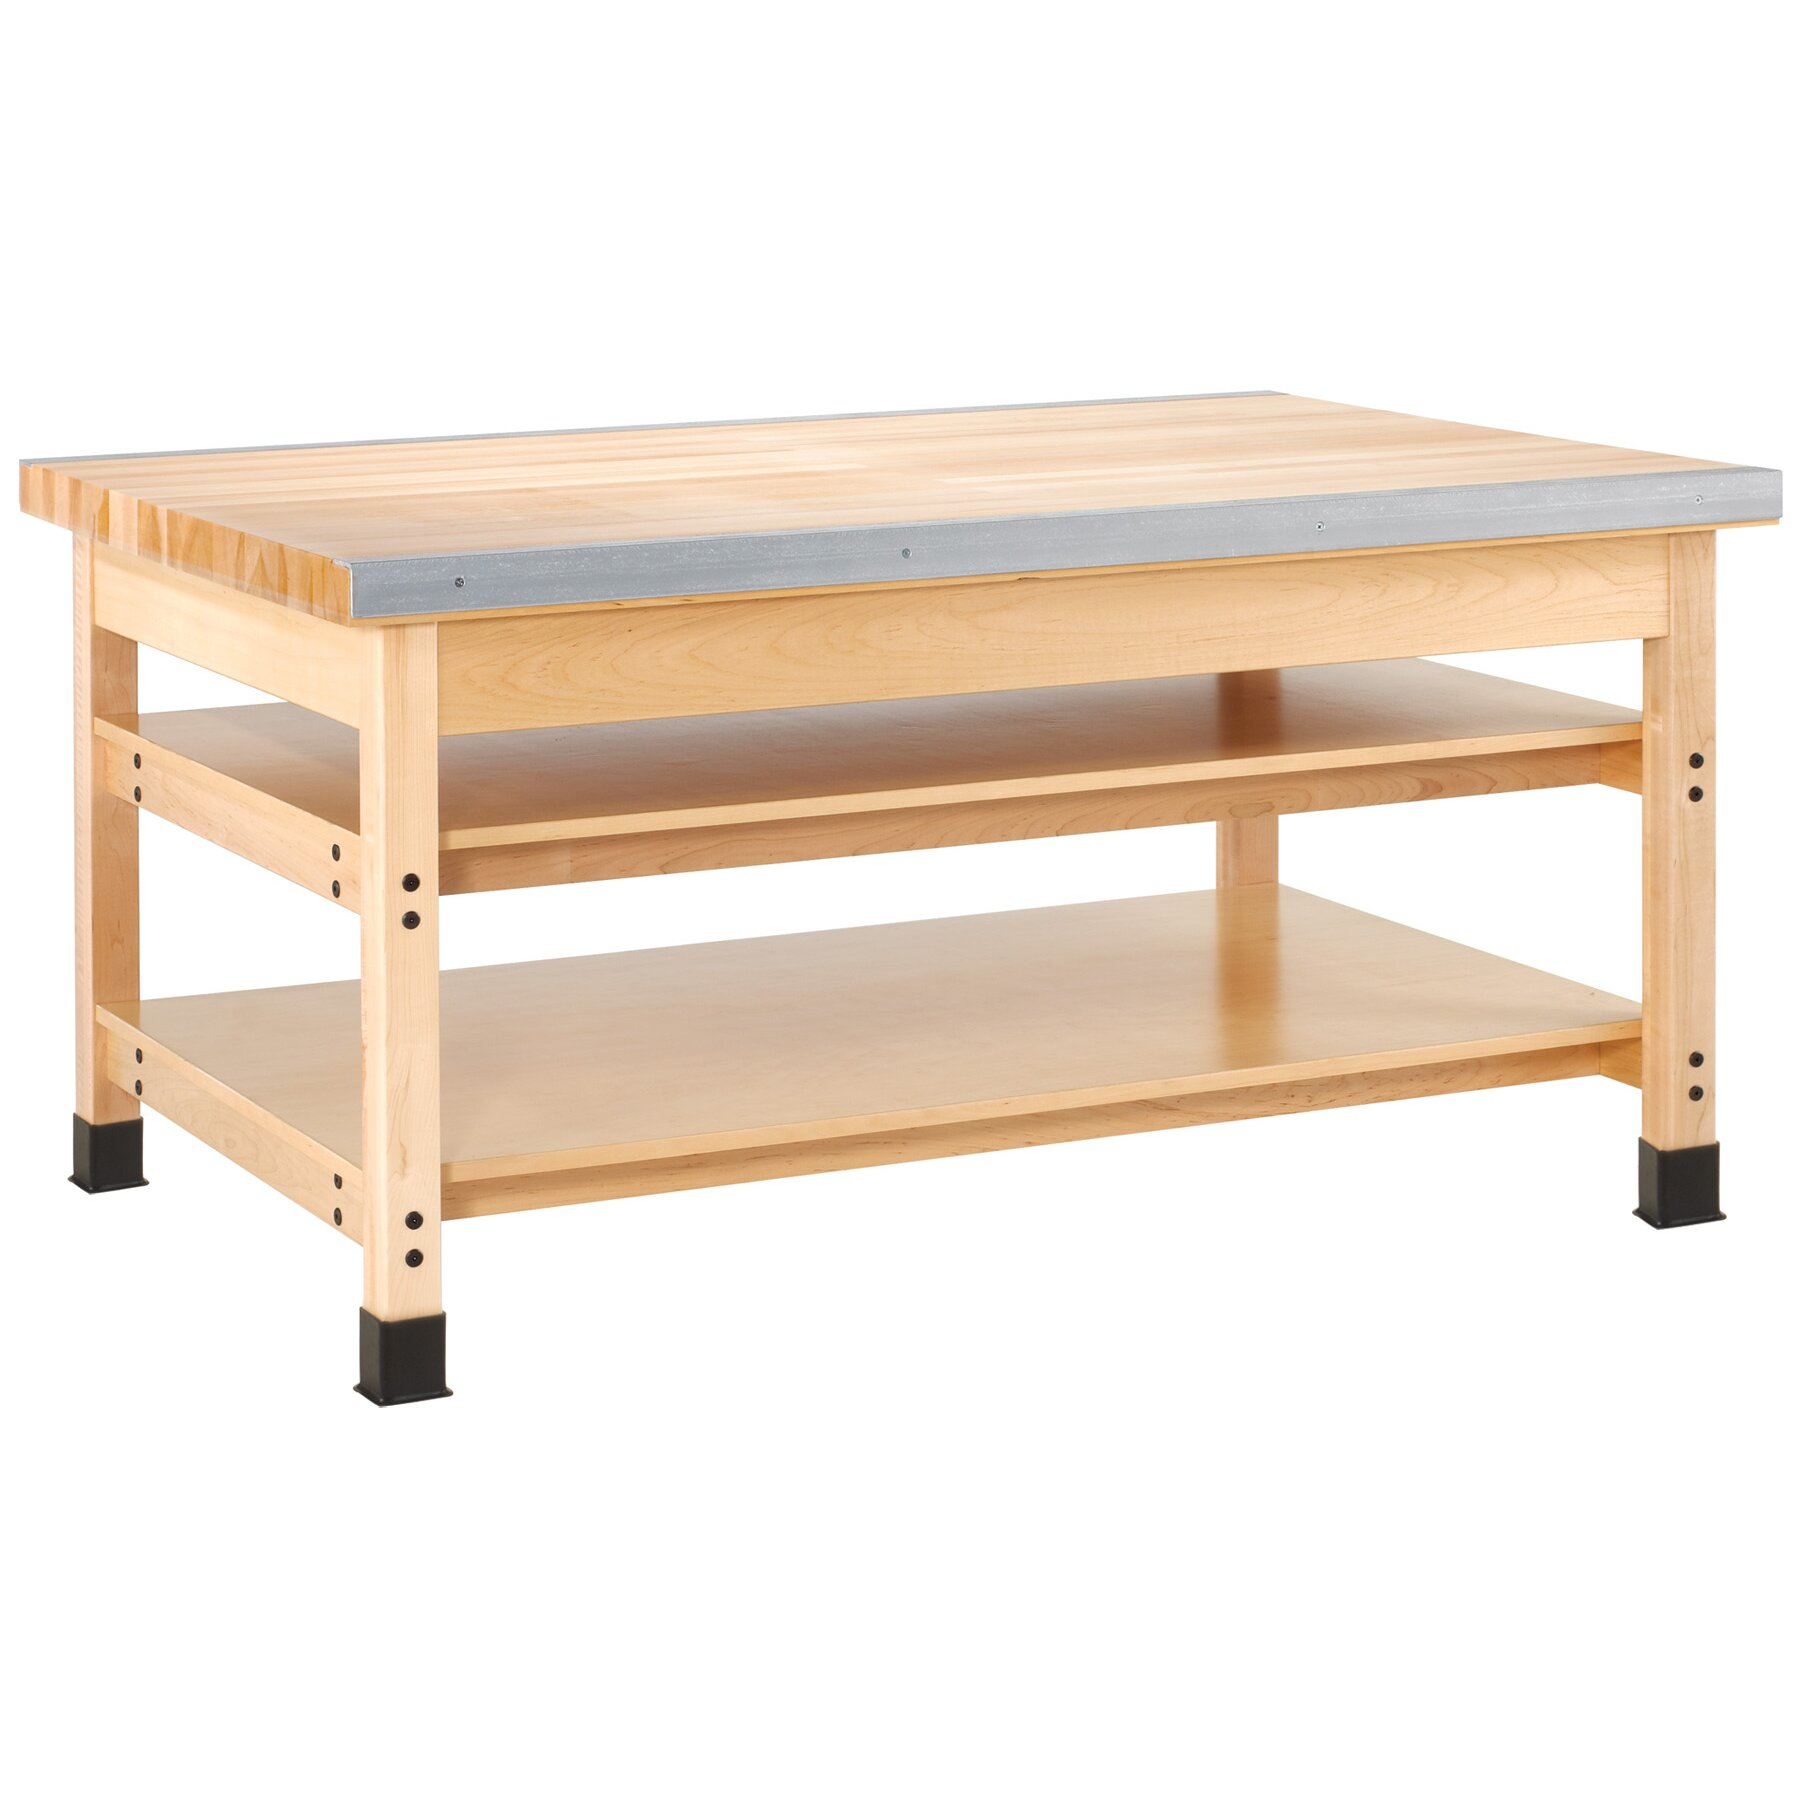 Shain Maple Top Workbench Wayfair Supply